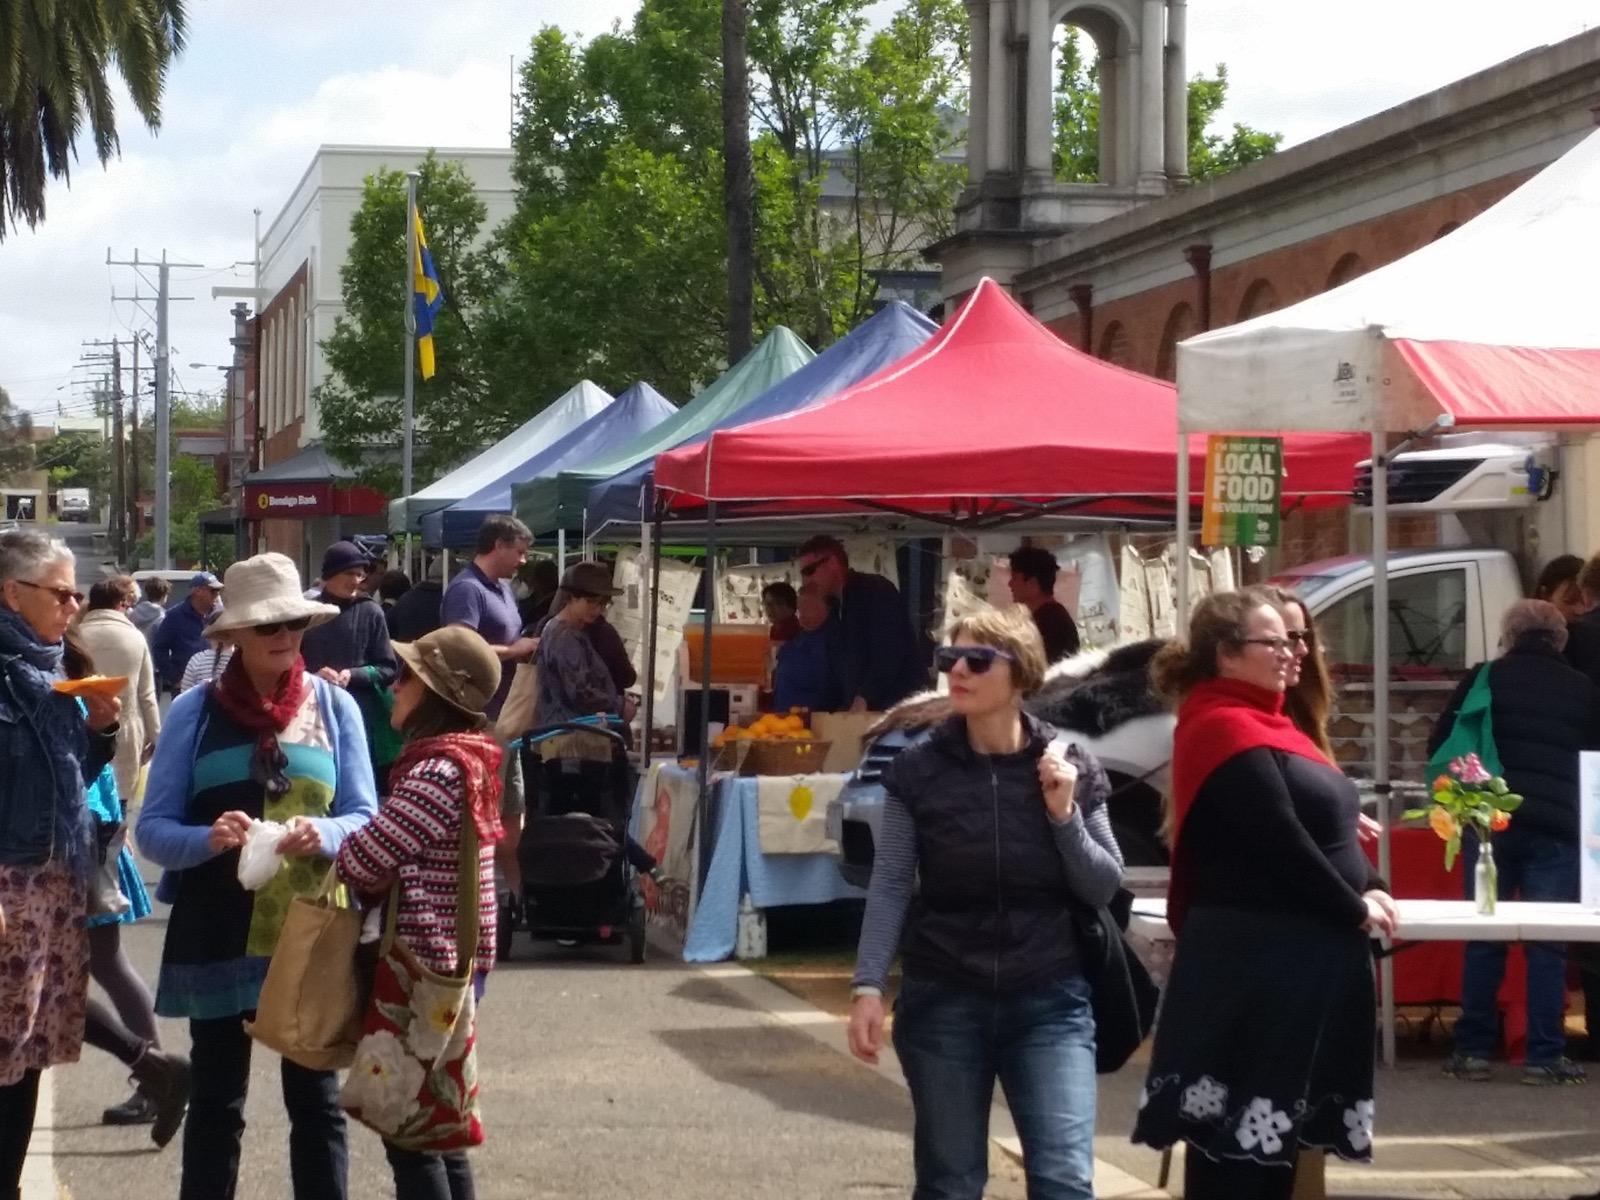 Market alongside the Market Building